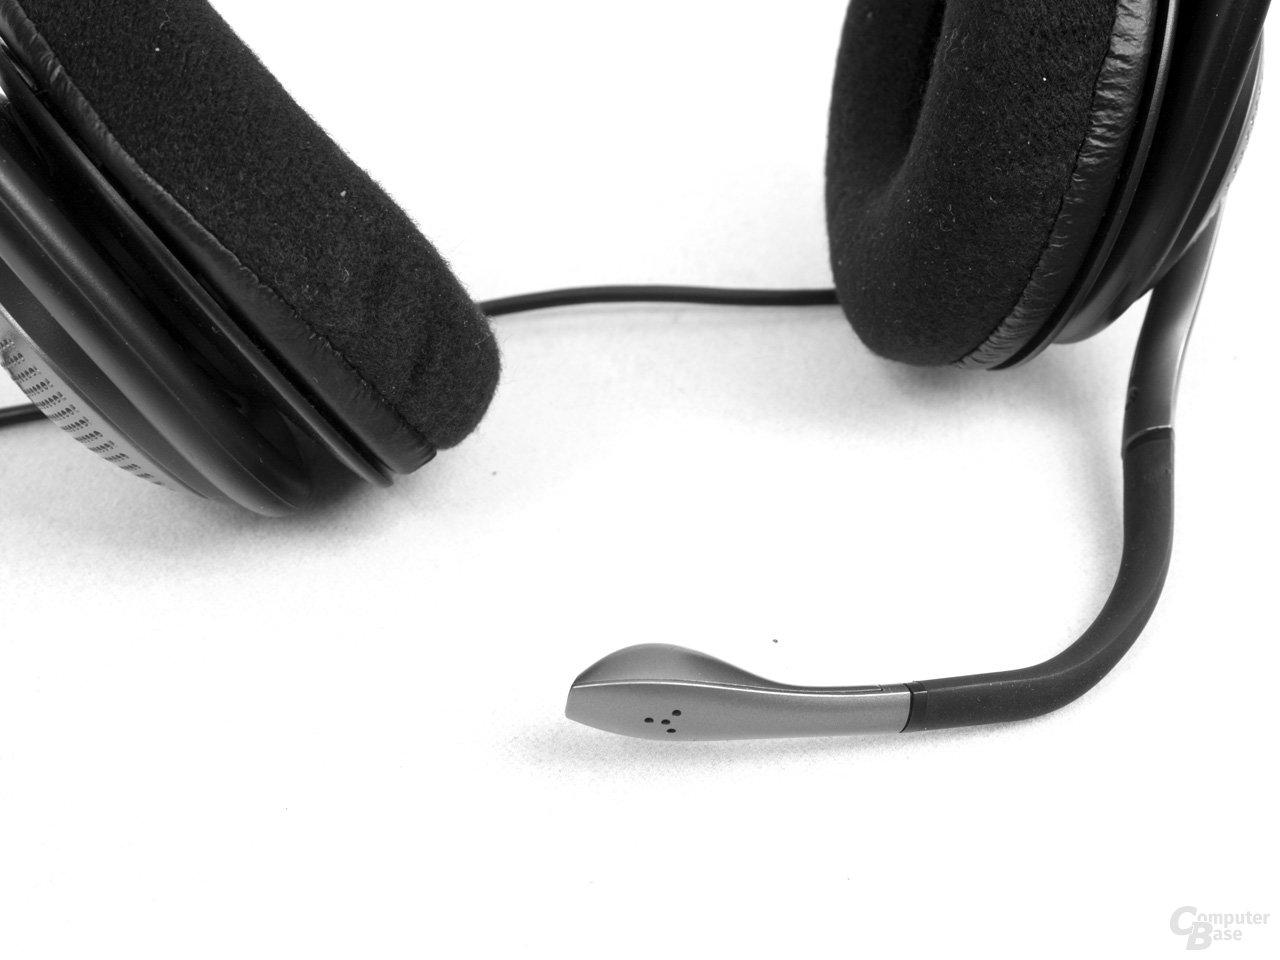 sehr flexibler Mikrofonarm